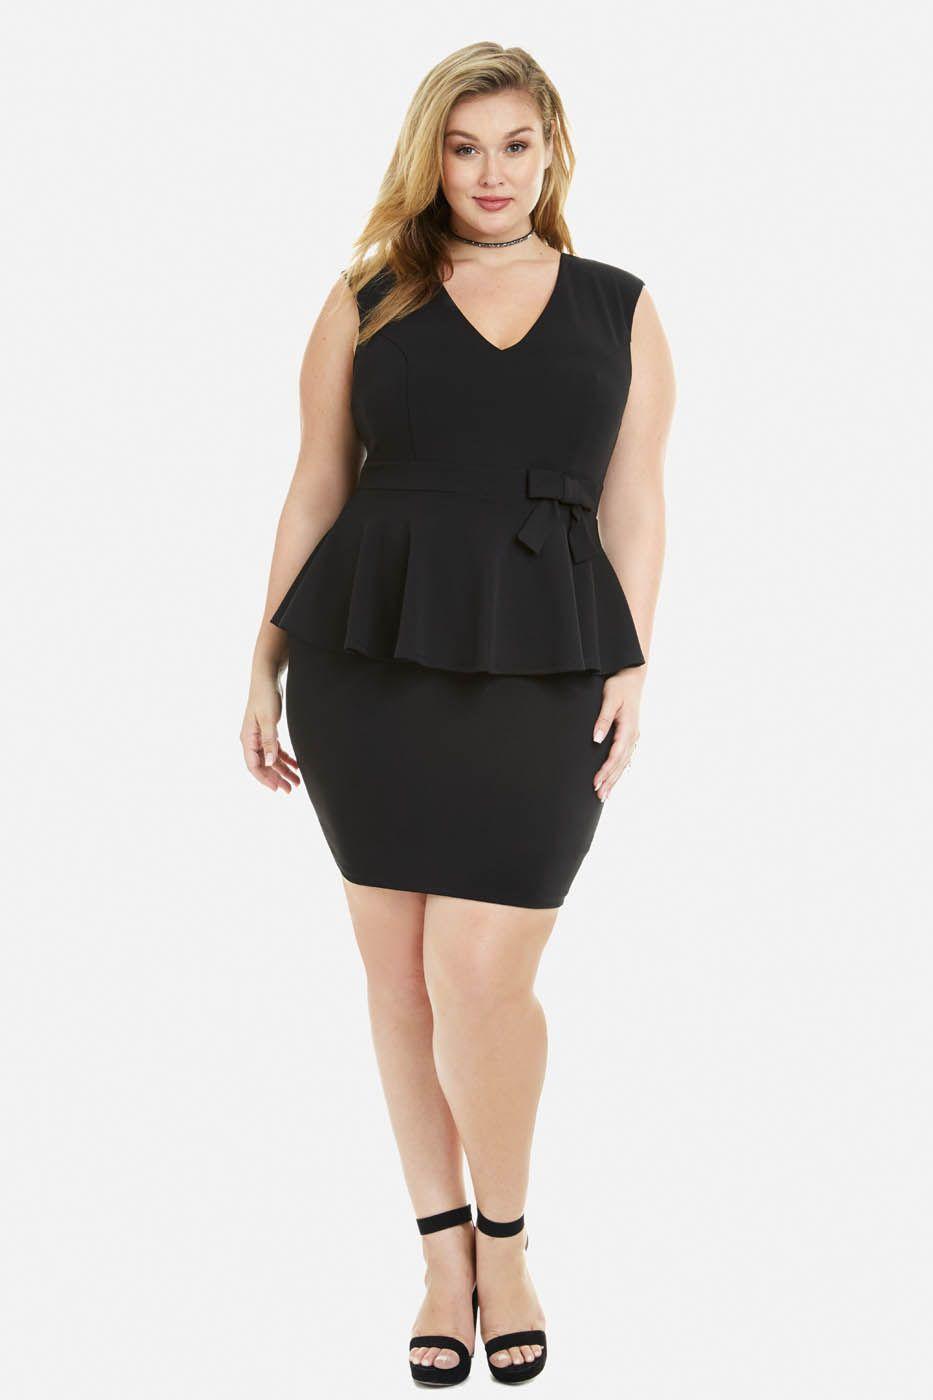 Plus Size Candy Peplum Bow Dress Fat And Belles Pinterest